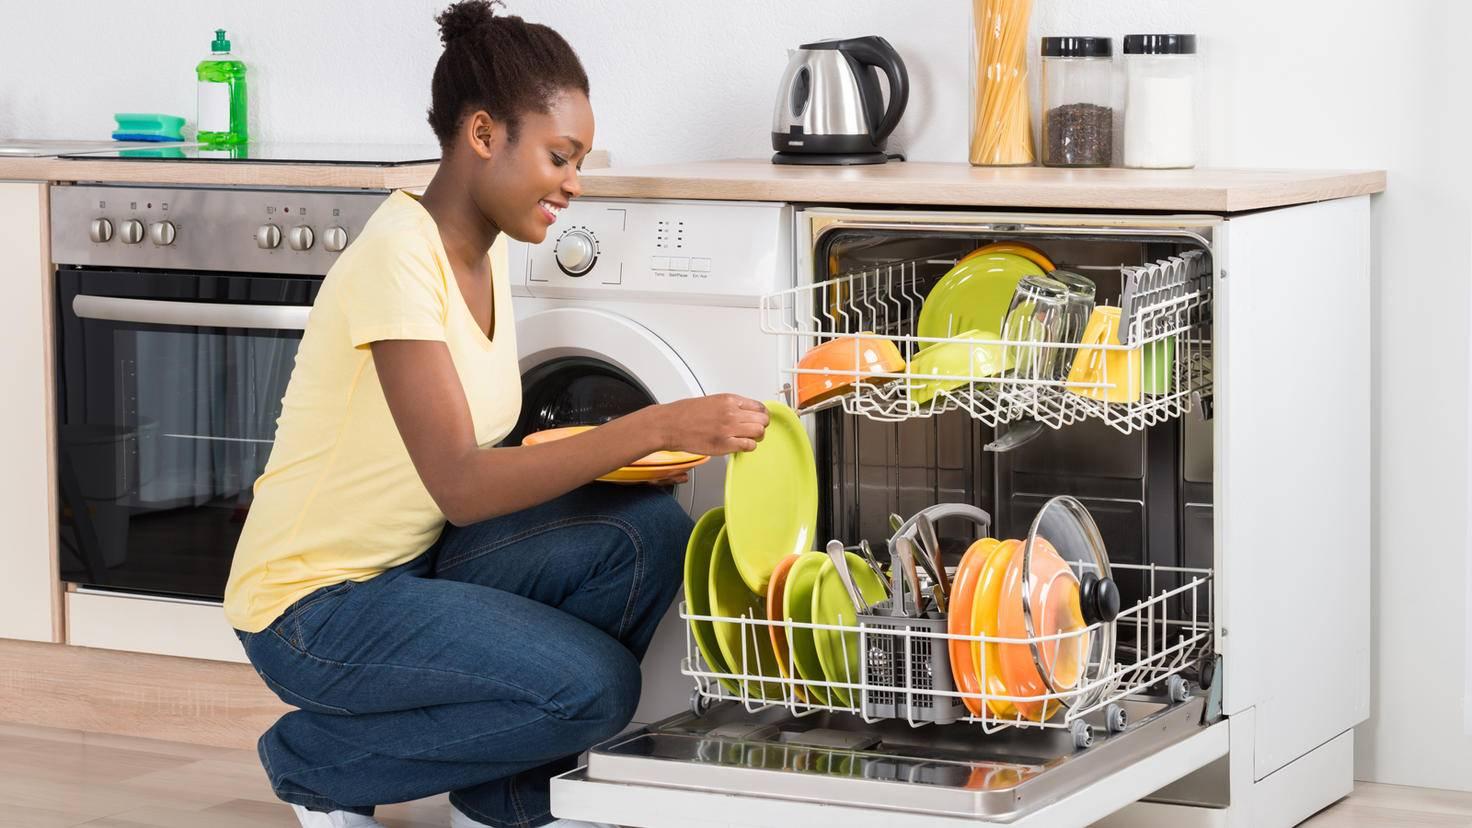 Lave-vaisselle-lave-vaisselle-AndreyPopov-ThinkstockPhotos-622210232